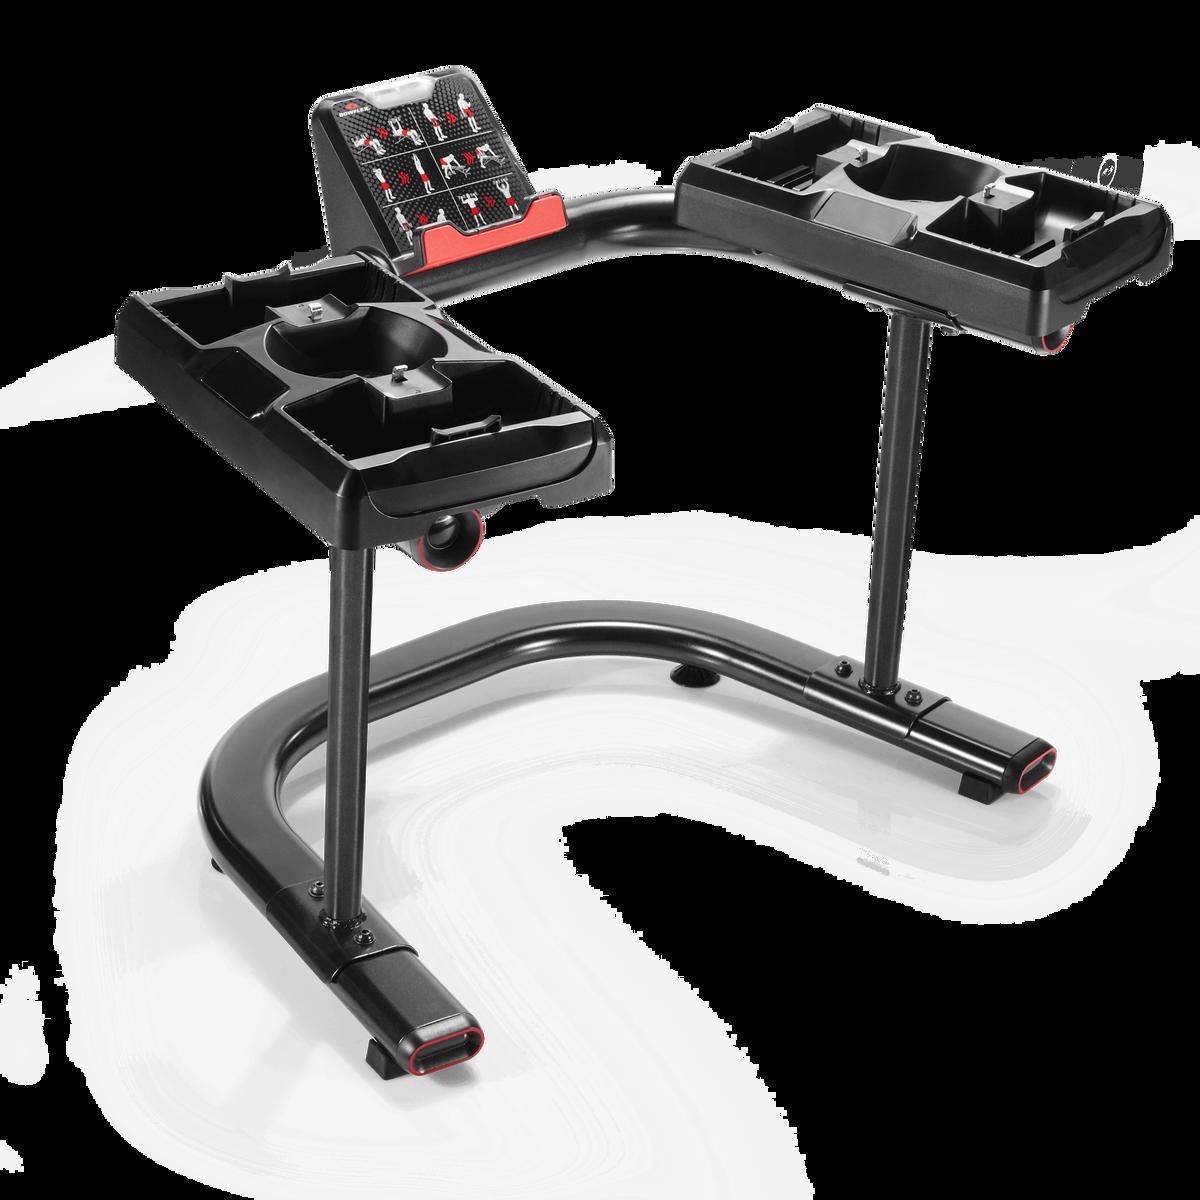 Bowflex SelectTech 560 Stand